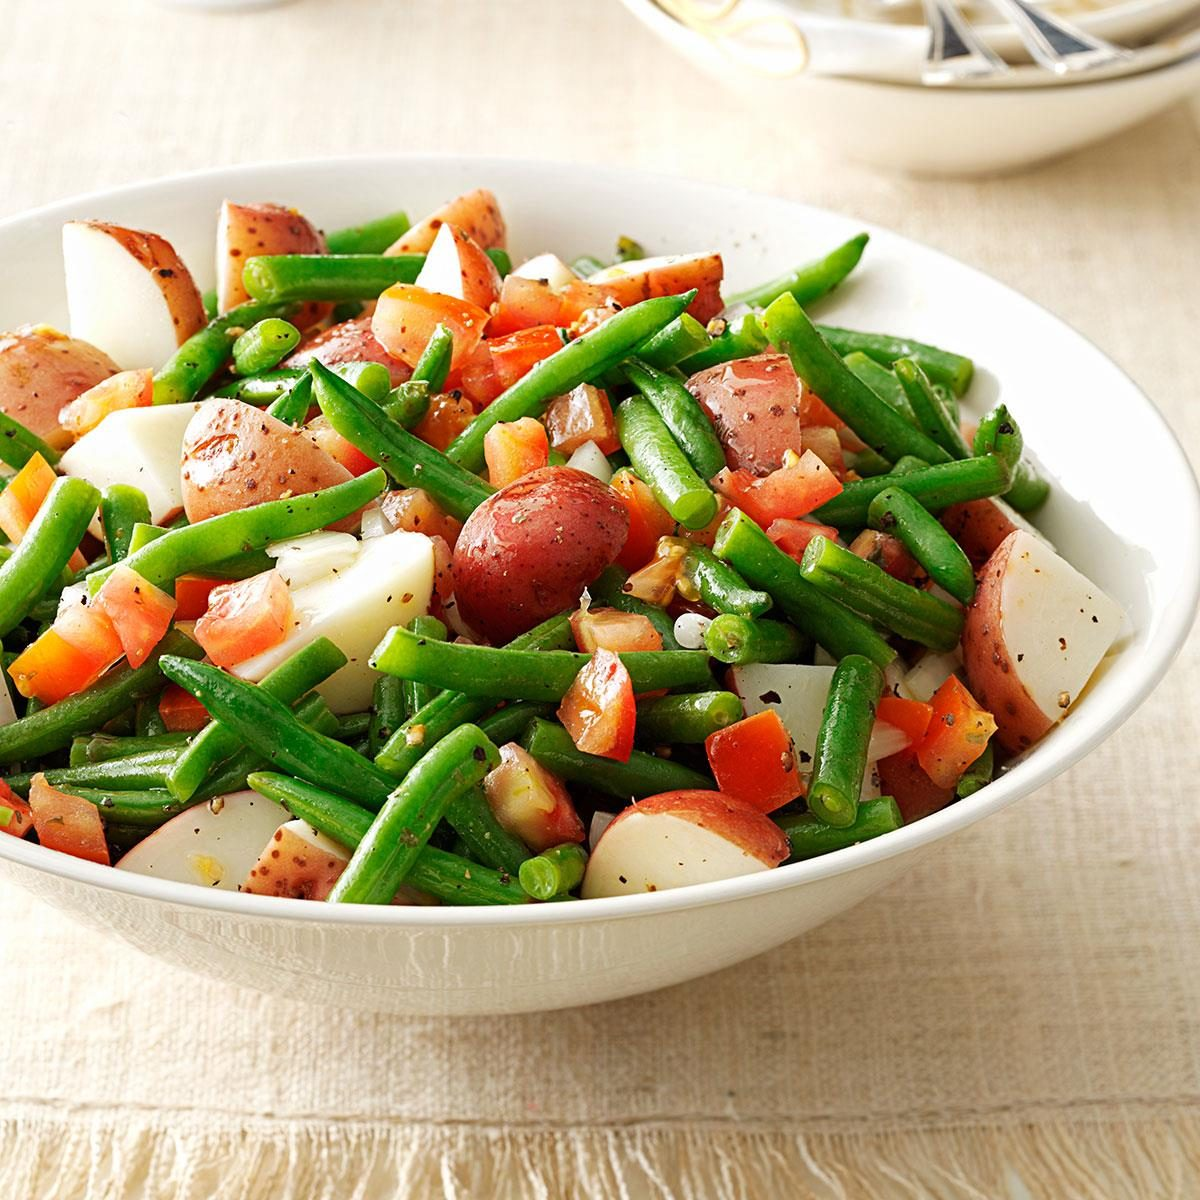 Warm Green Bean & Potato Salad Recipe | Taste of Home